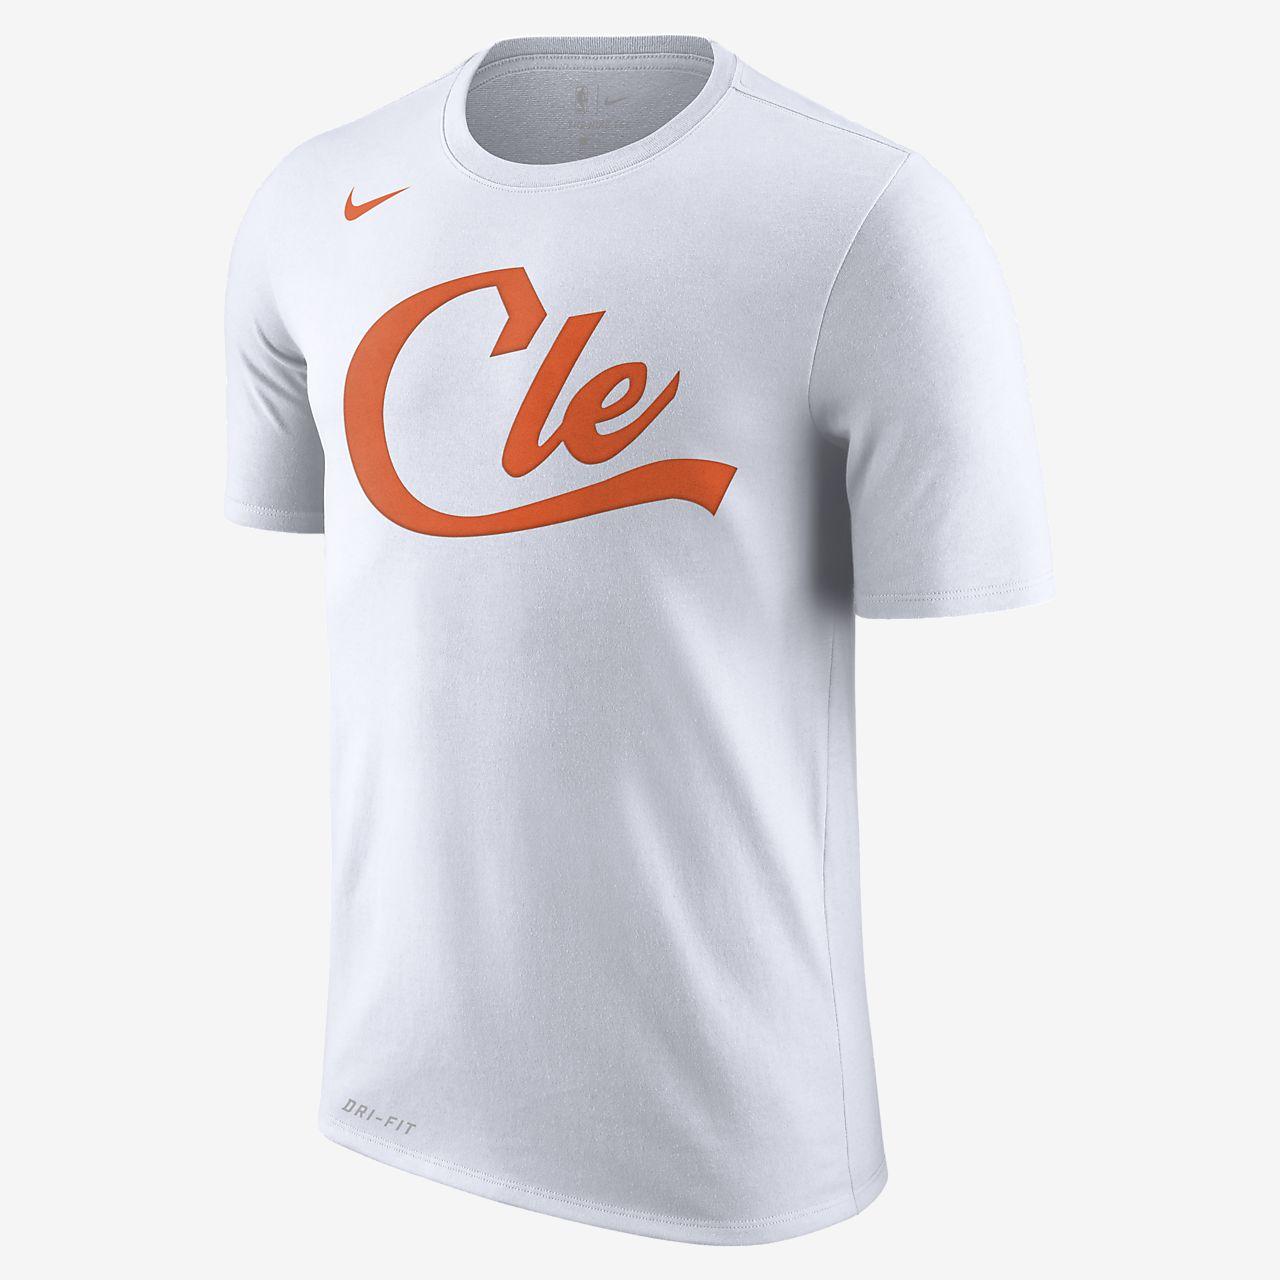 2f52a553e Cleveland Cavaliers City Edition Nike Dri-FIT Men s NBA T-Shirt ...